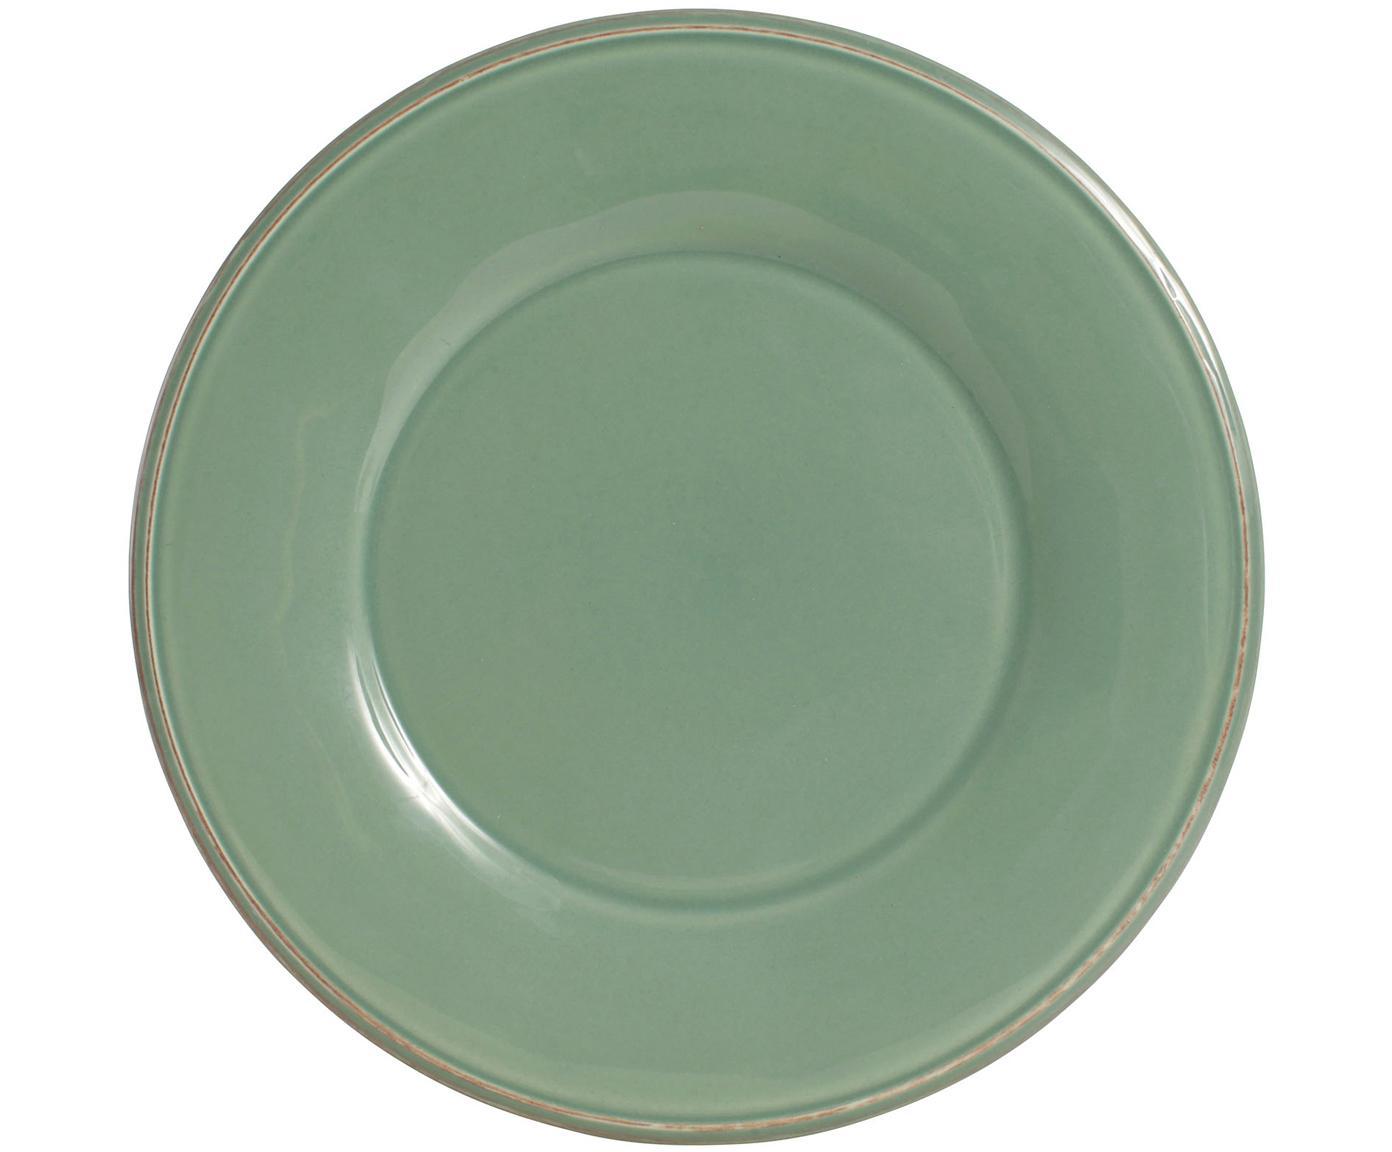 Piatto piano in verde salvia Constance 2 pz, Ceramica, Verde salvia, Ø 29 cm